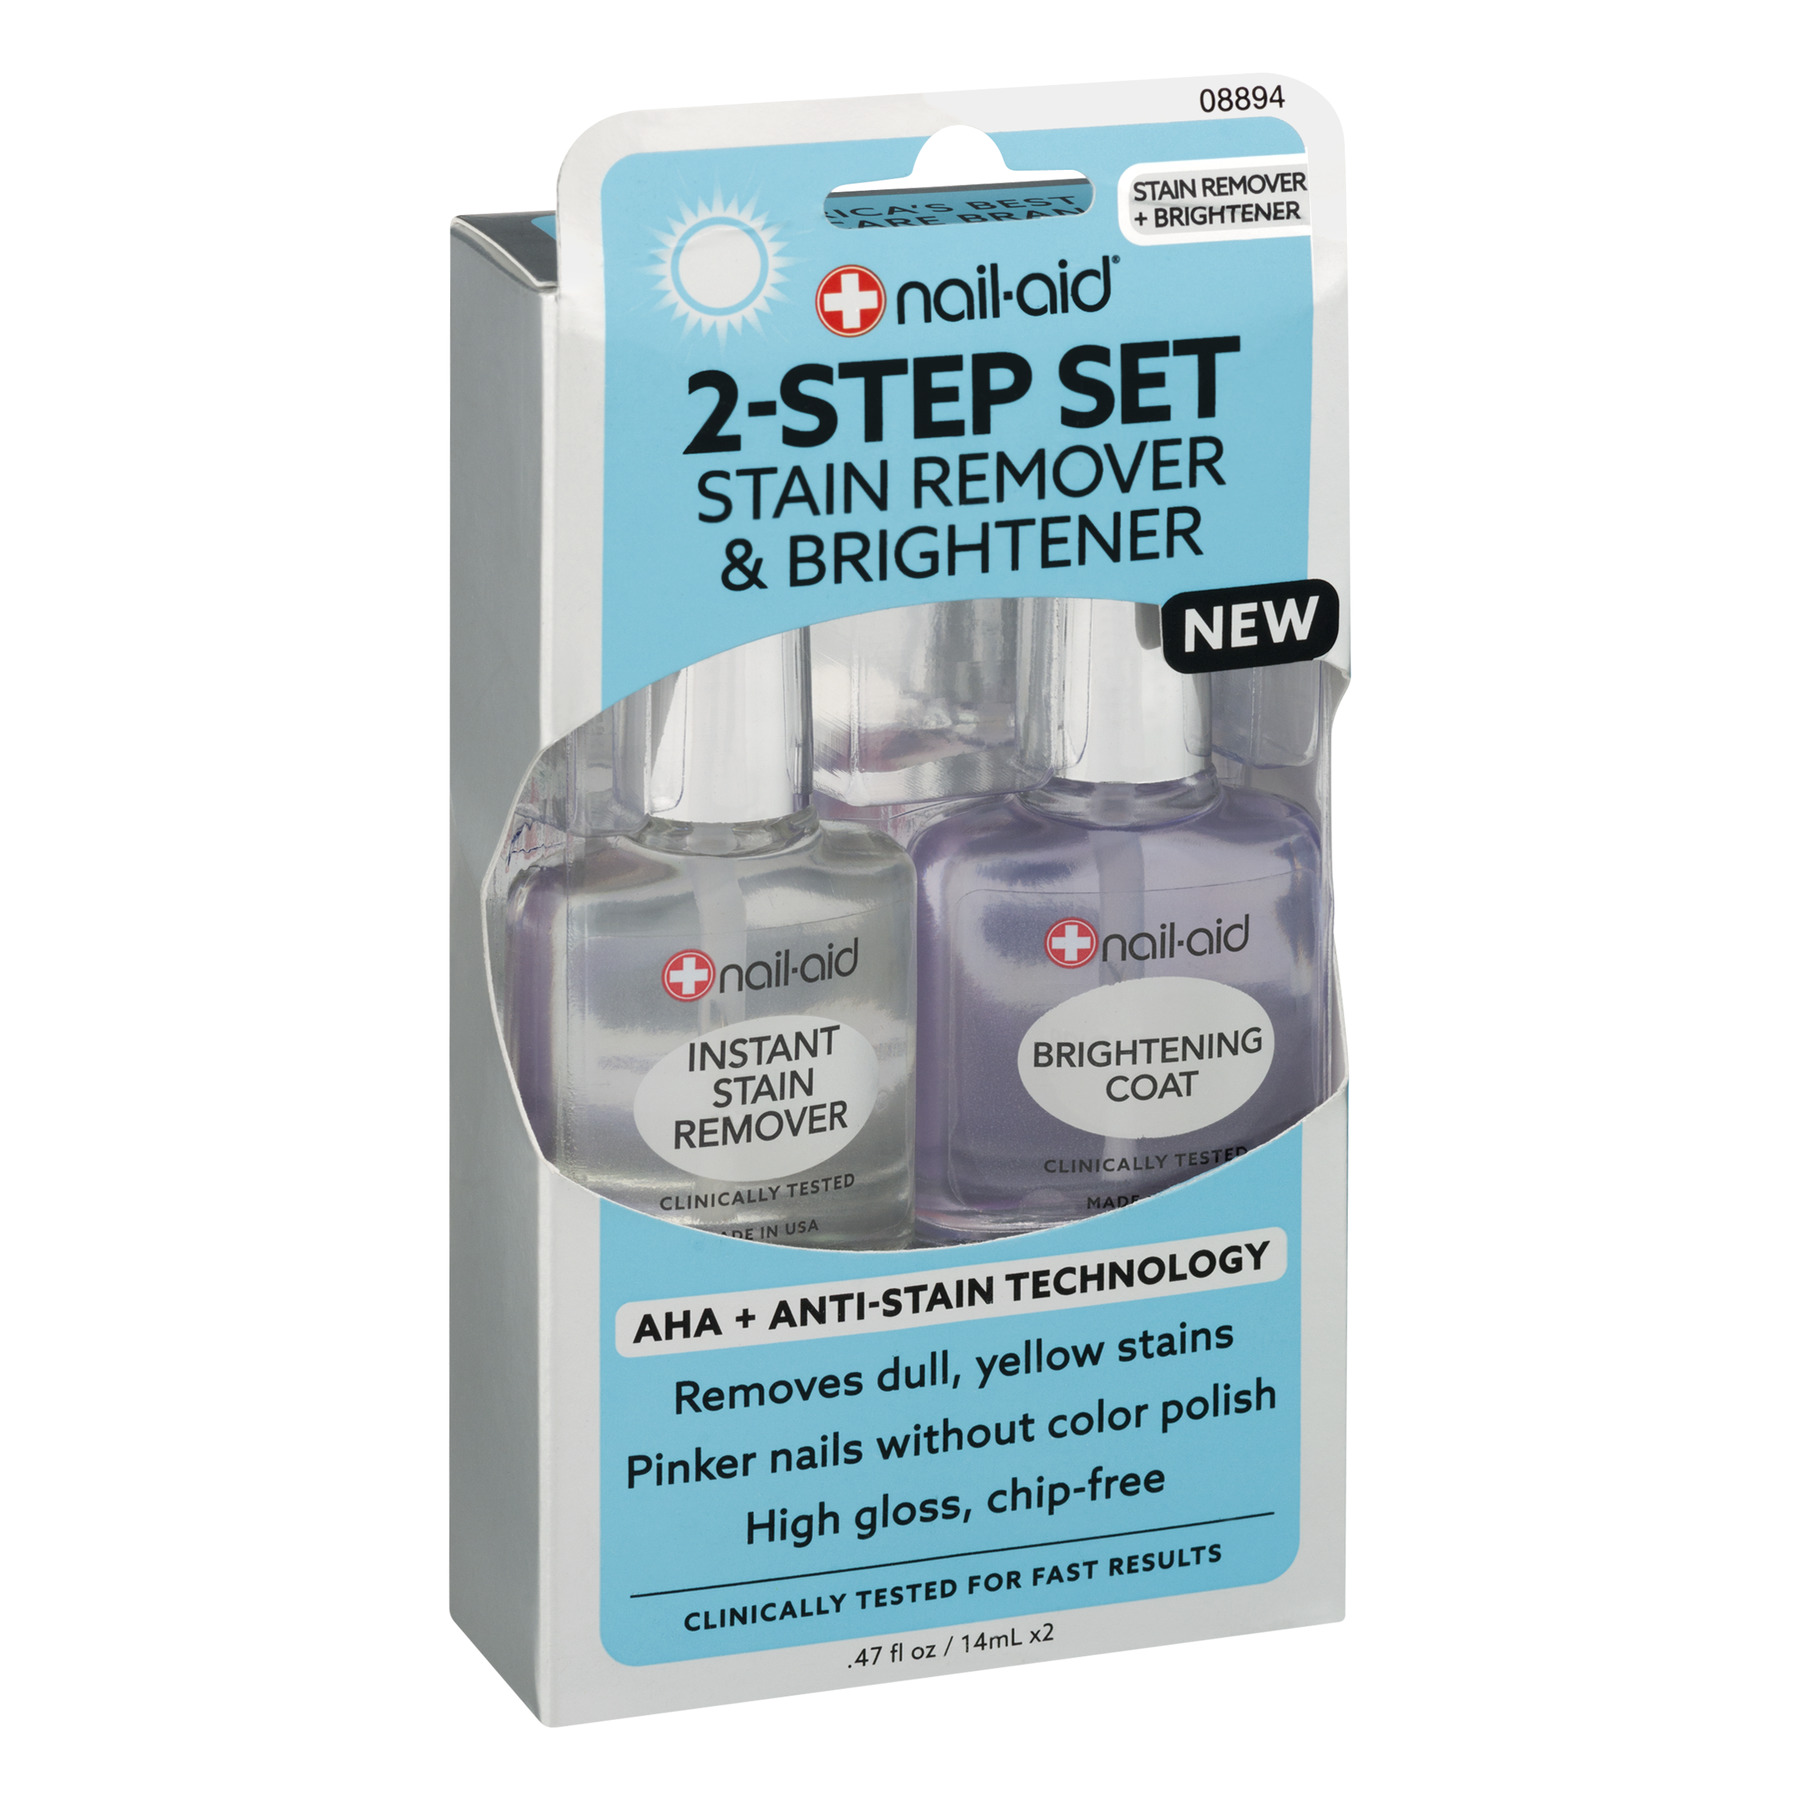 Nail Aid 2 Step Set Stain Remover Brightener 2 0 Piece S Walmart Com Walmart Com